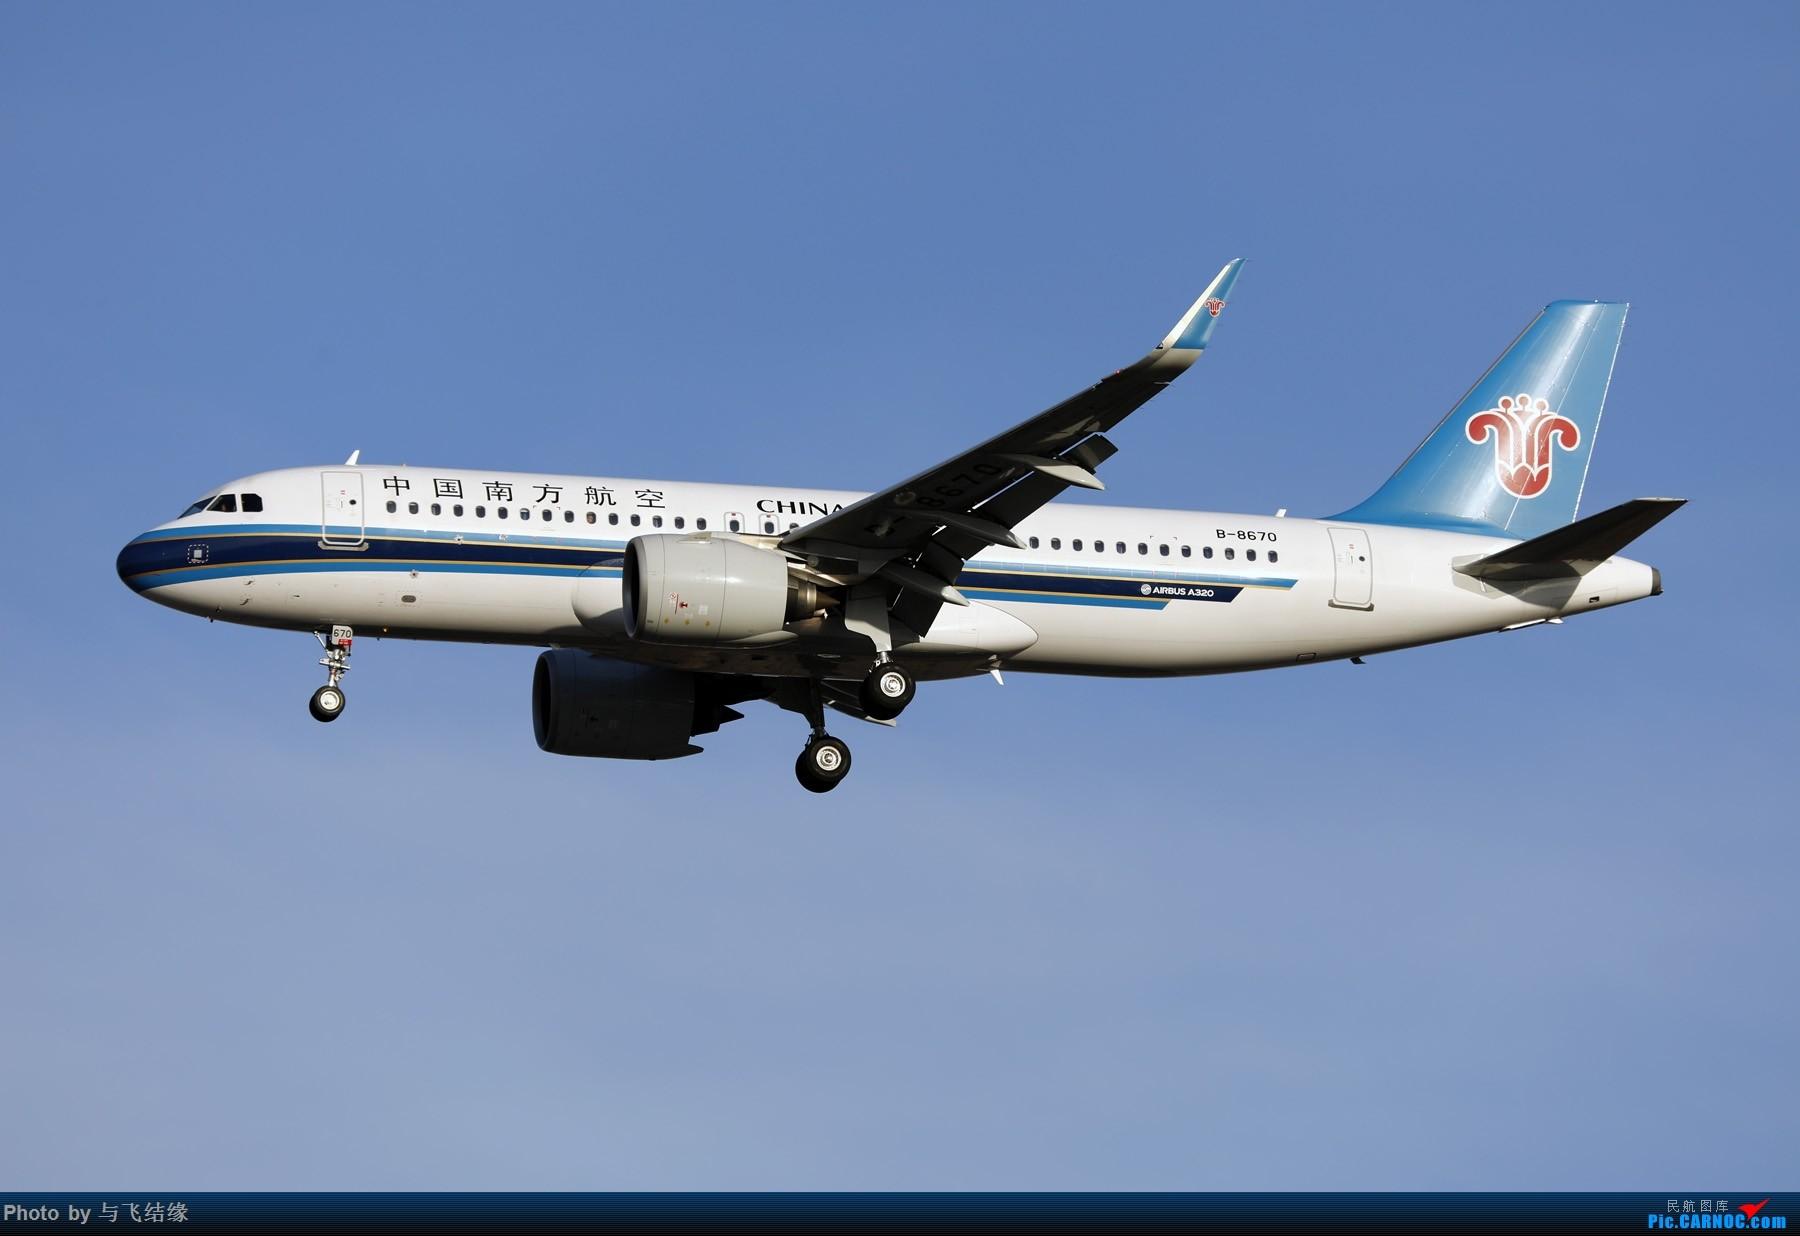 Re:[原创]以色列航空波音777-200、加拿大航空波音77W新装、国航最新空客350-900. AIRBUS A320NEO B-8670 中国北京首都国际机场